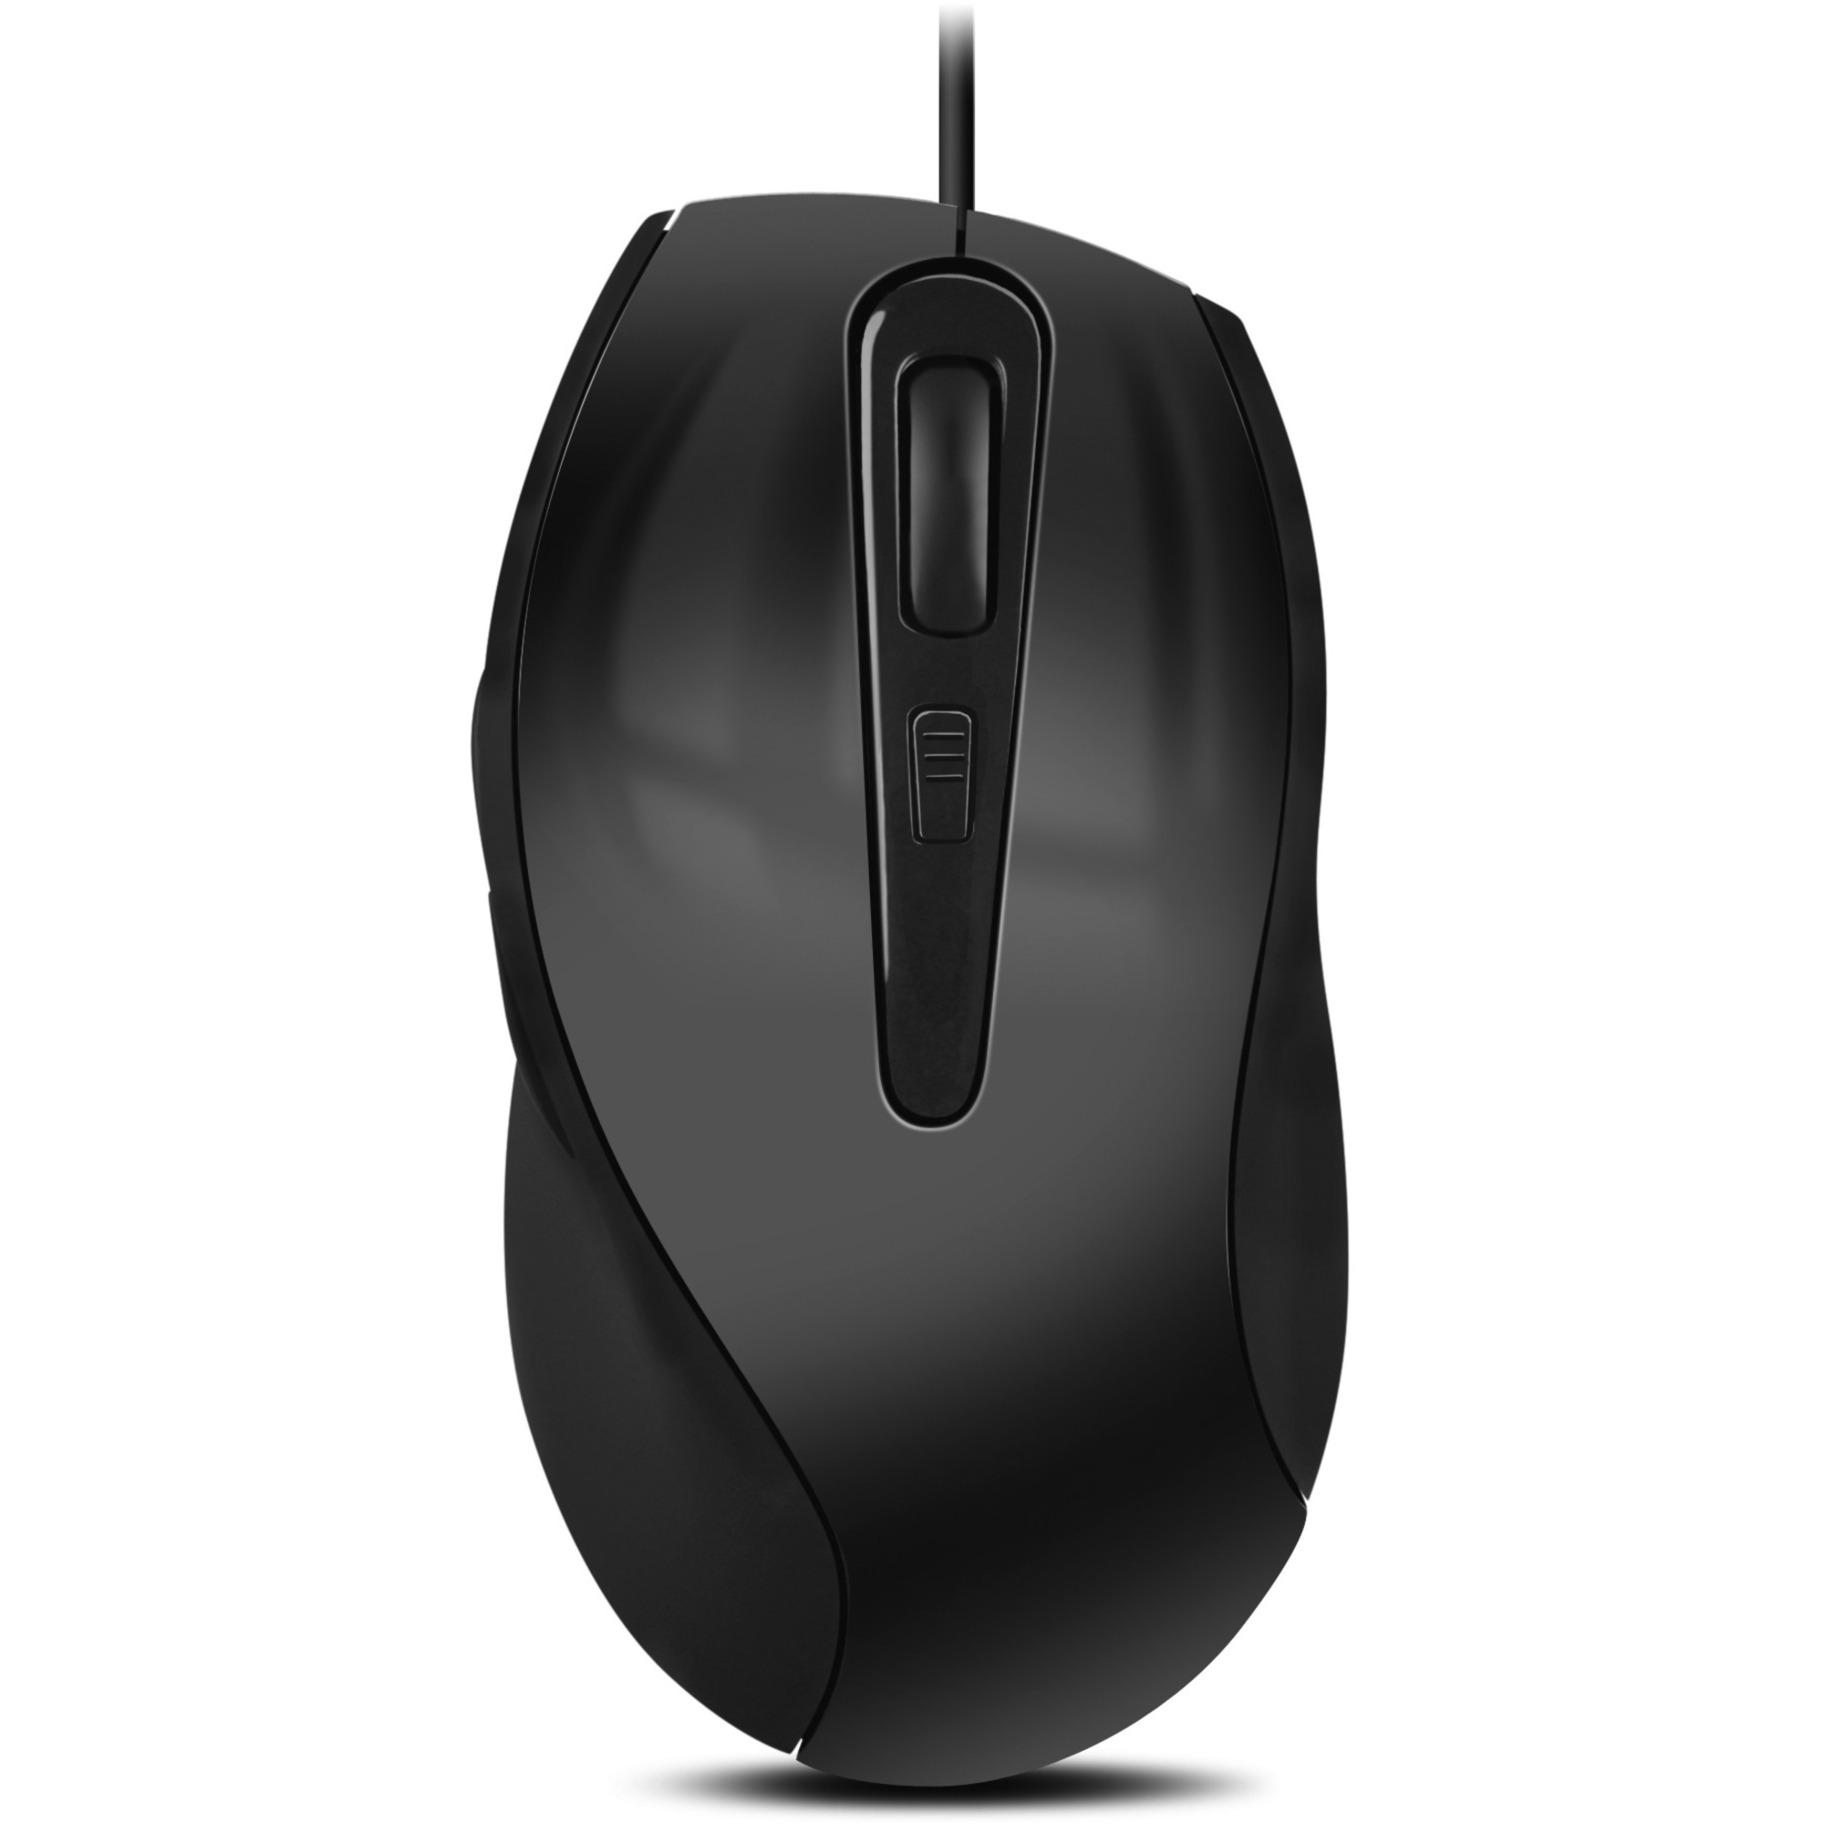 Axon ratón USB Óptico 2400 DPI Ambidextro Negro, Gris